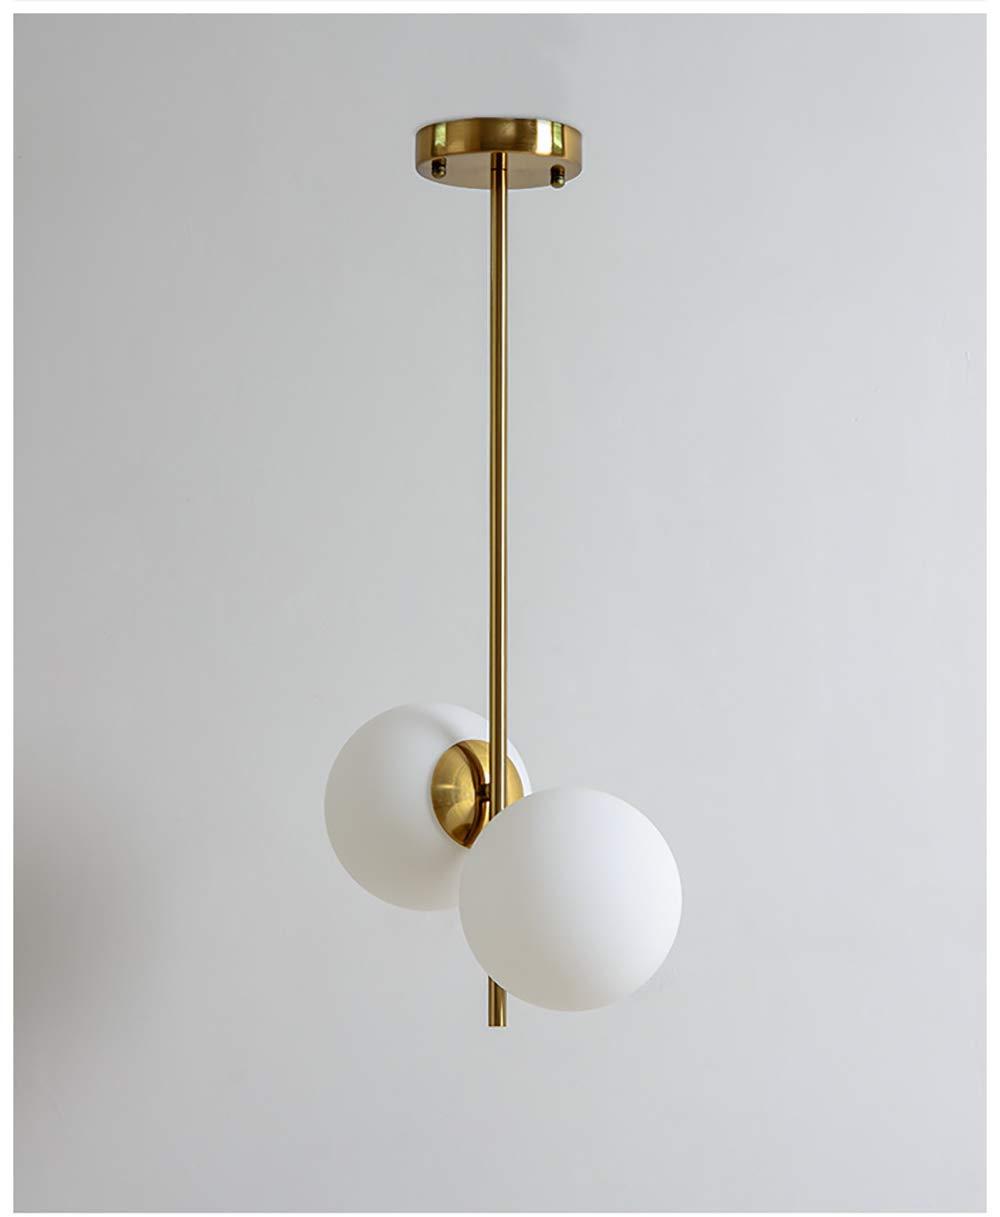 SXMY Bola de Cristal n/órdica Ara/ña Redonda L/ámpara Colgante LED Accesorio de iluminaci/ón Interior Luces Decorativas para la Sala de Estar dormitorio-gold-1head